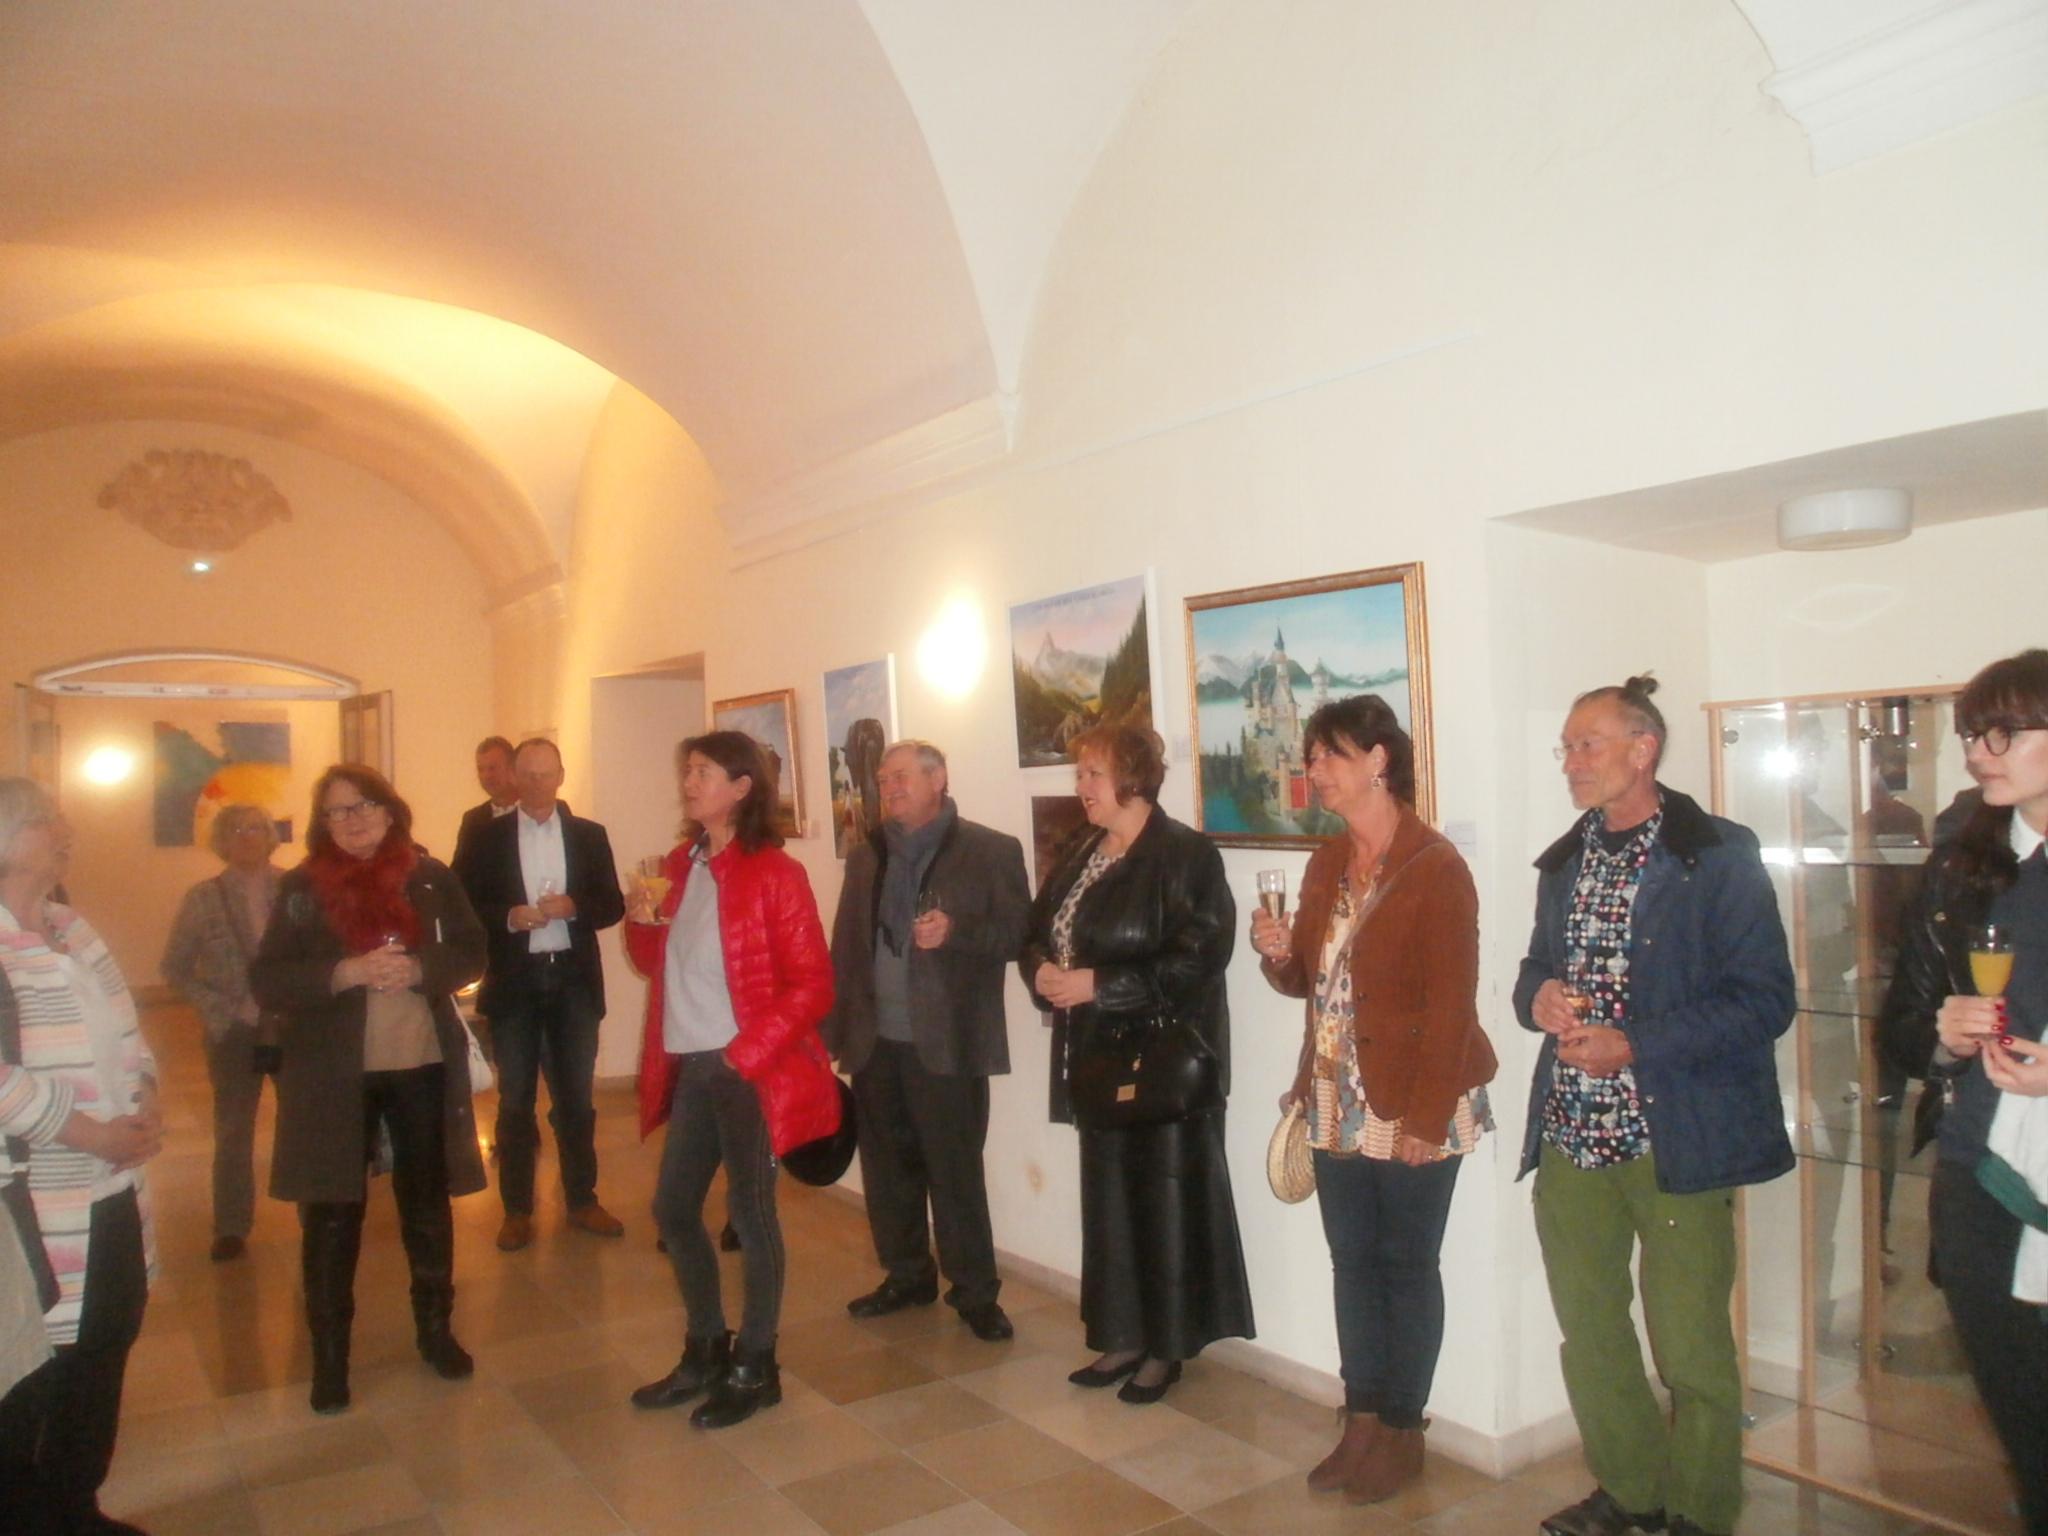 Die erste Vernissage des Neunburger Kunstvereins Unverdorben am Samstag, 4. Mai 2019 im Kreuzgang des Klosters Ensdorf. Fotos: Karl Stumpfi, KVU-Medienreferent